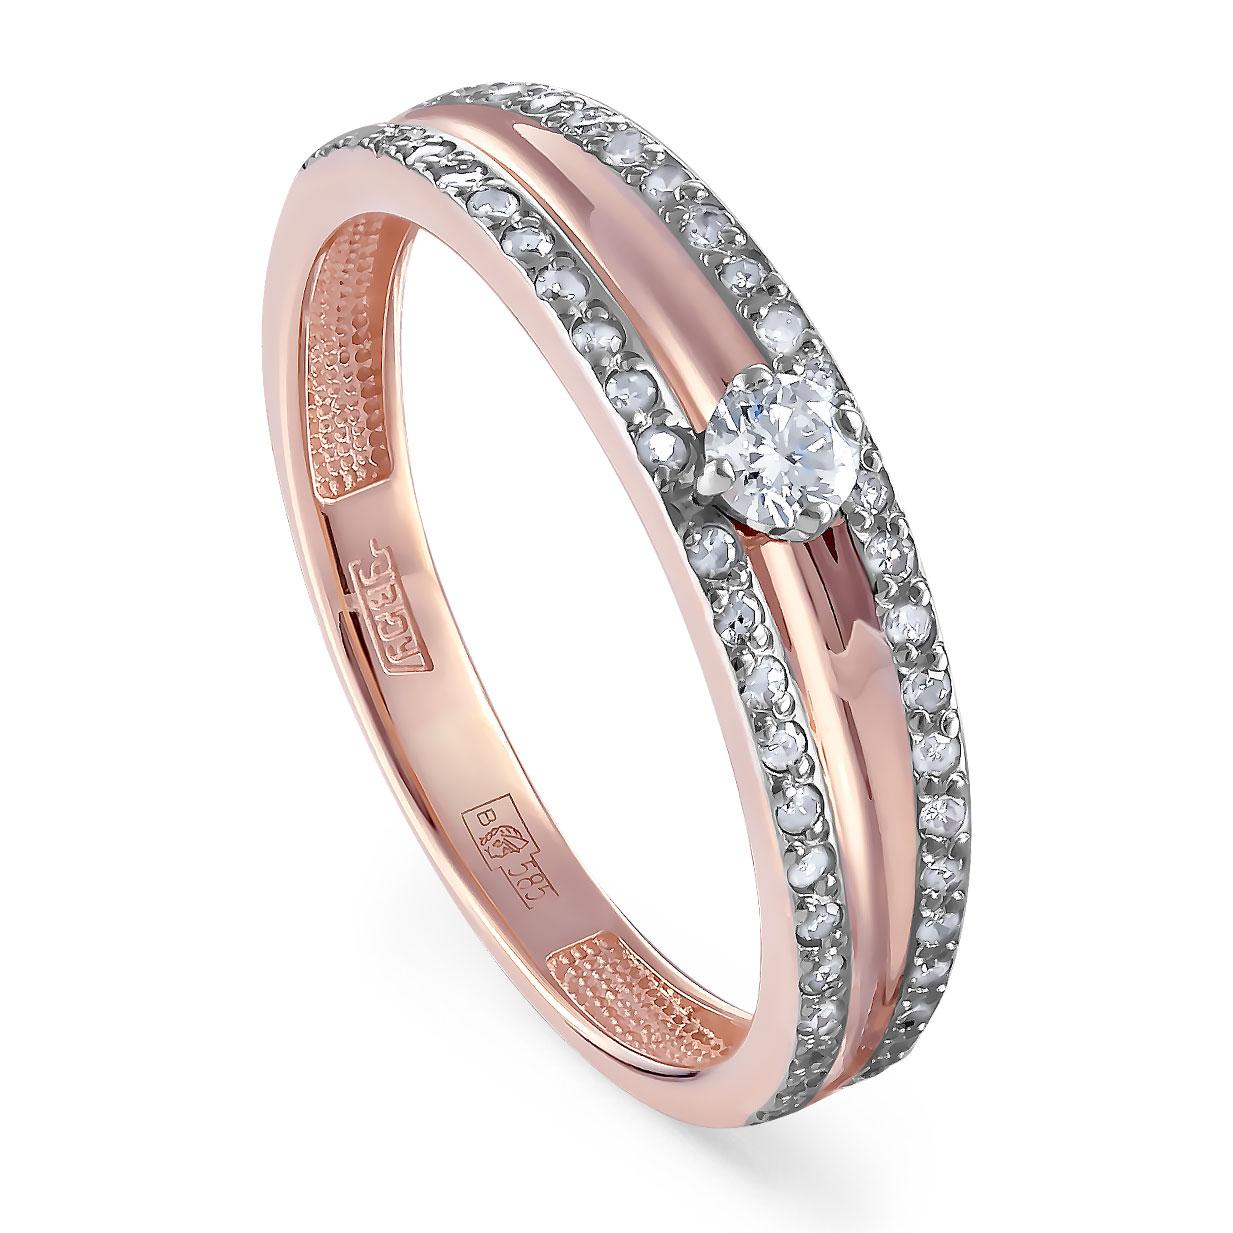 Золотое кольцо Бриллиант арт. 11-01183-1000 11-01183-1000